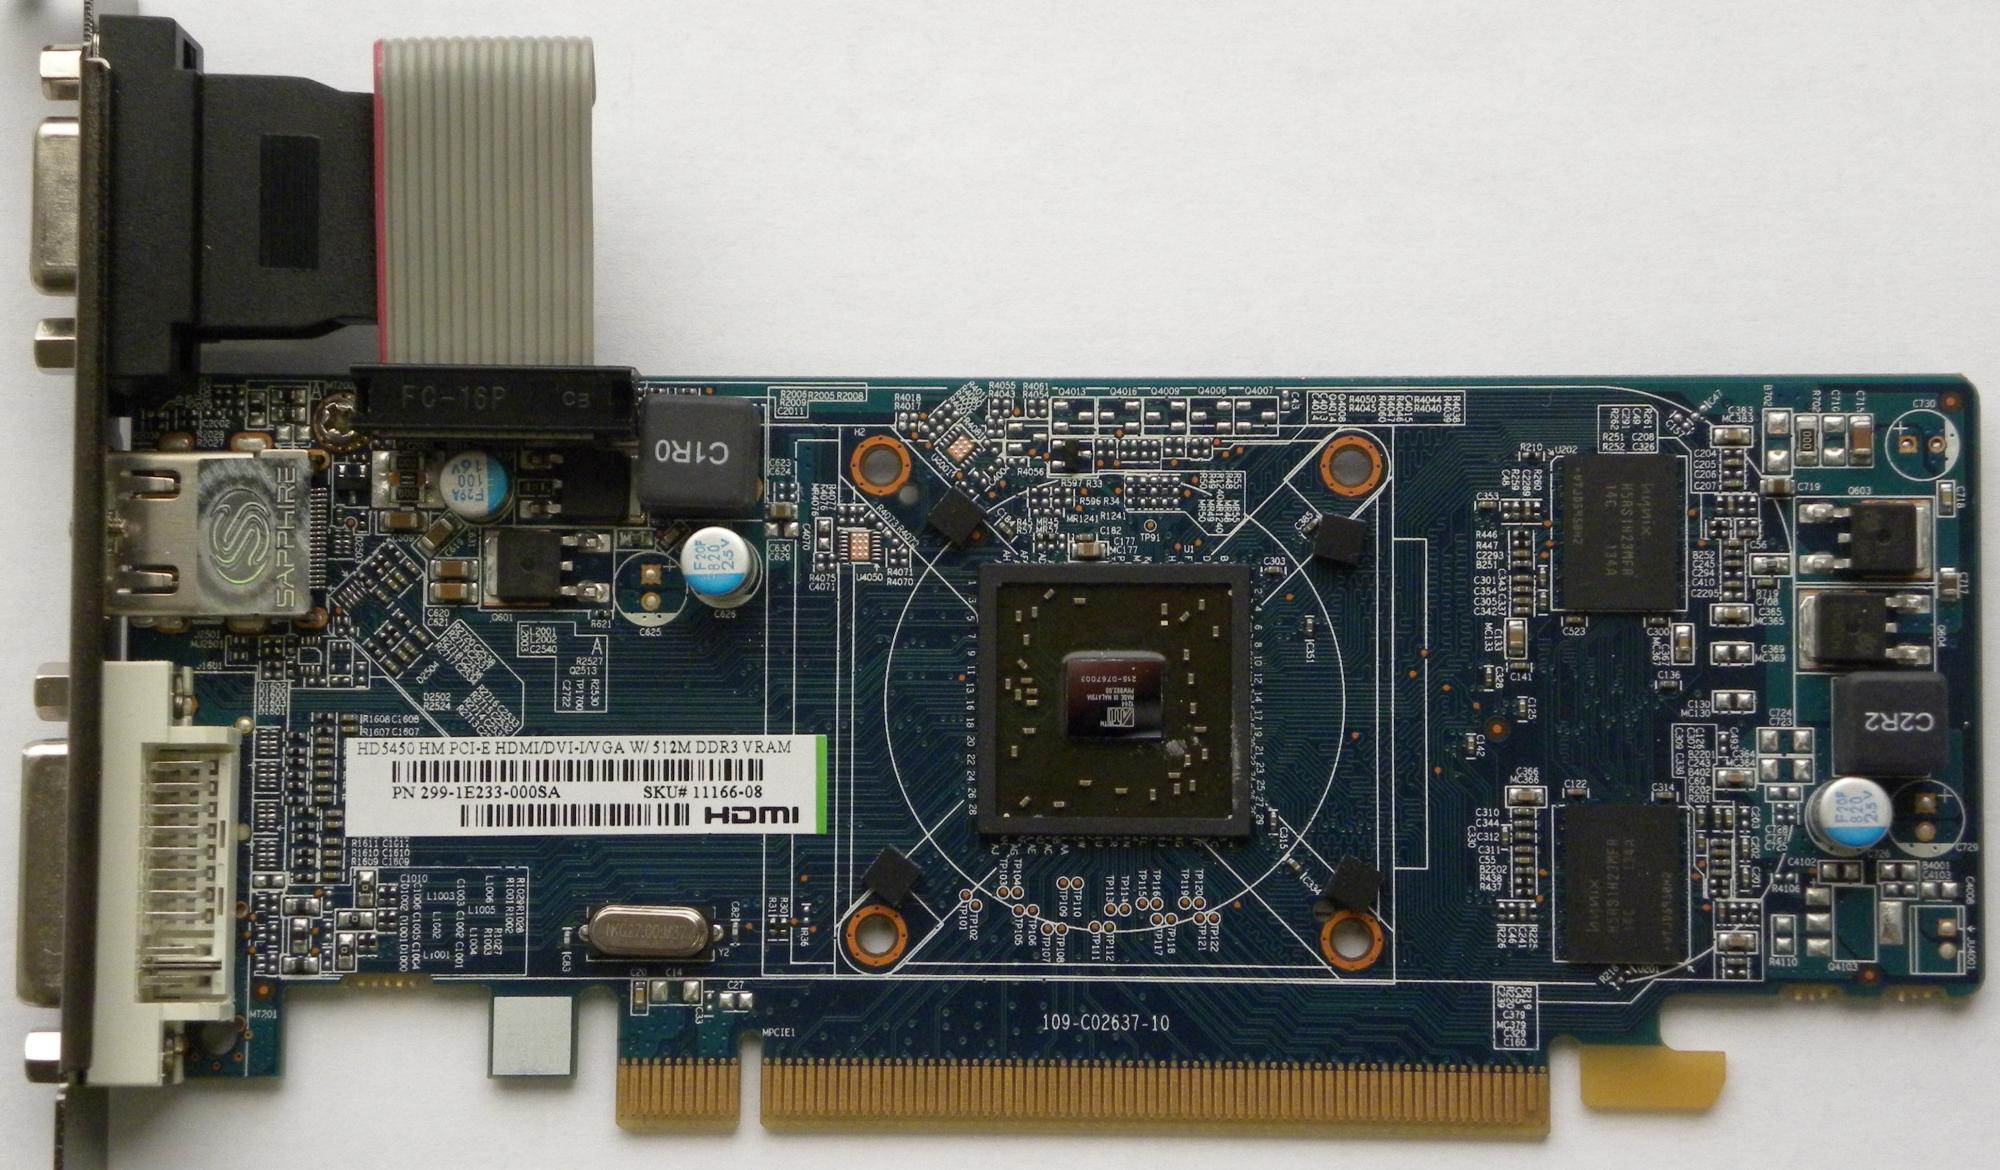 ATI Radeon Xpress driver update for OpenGL